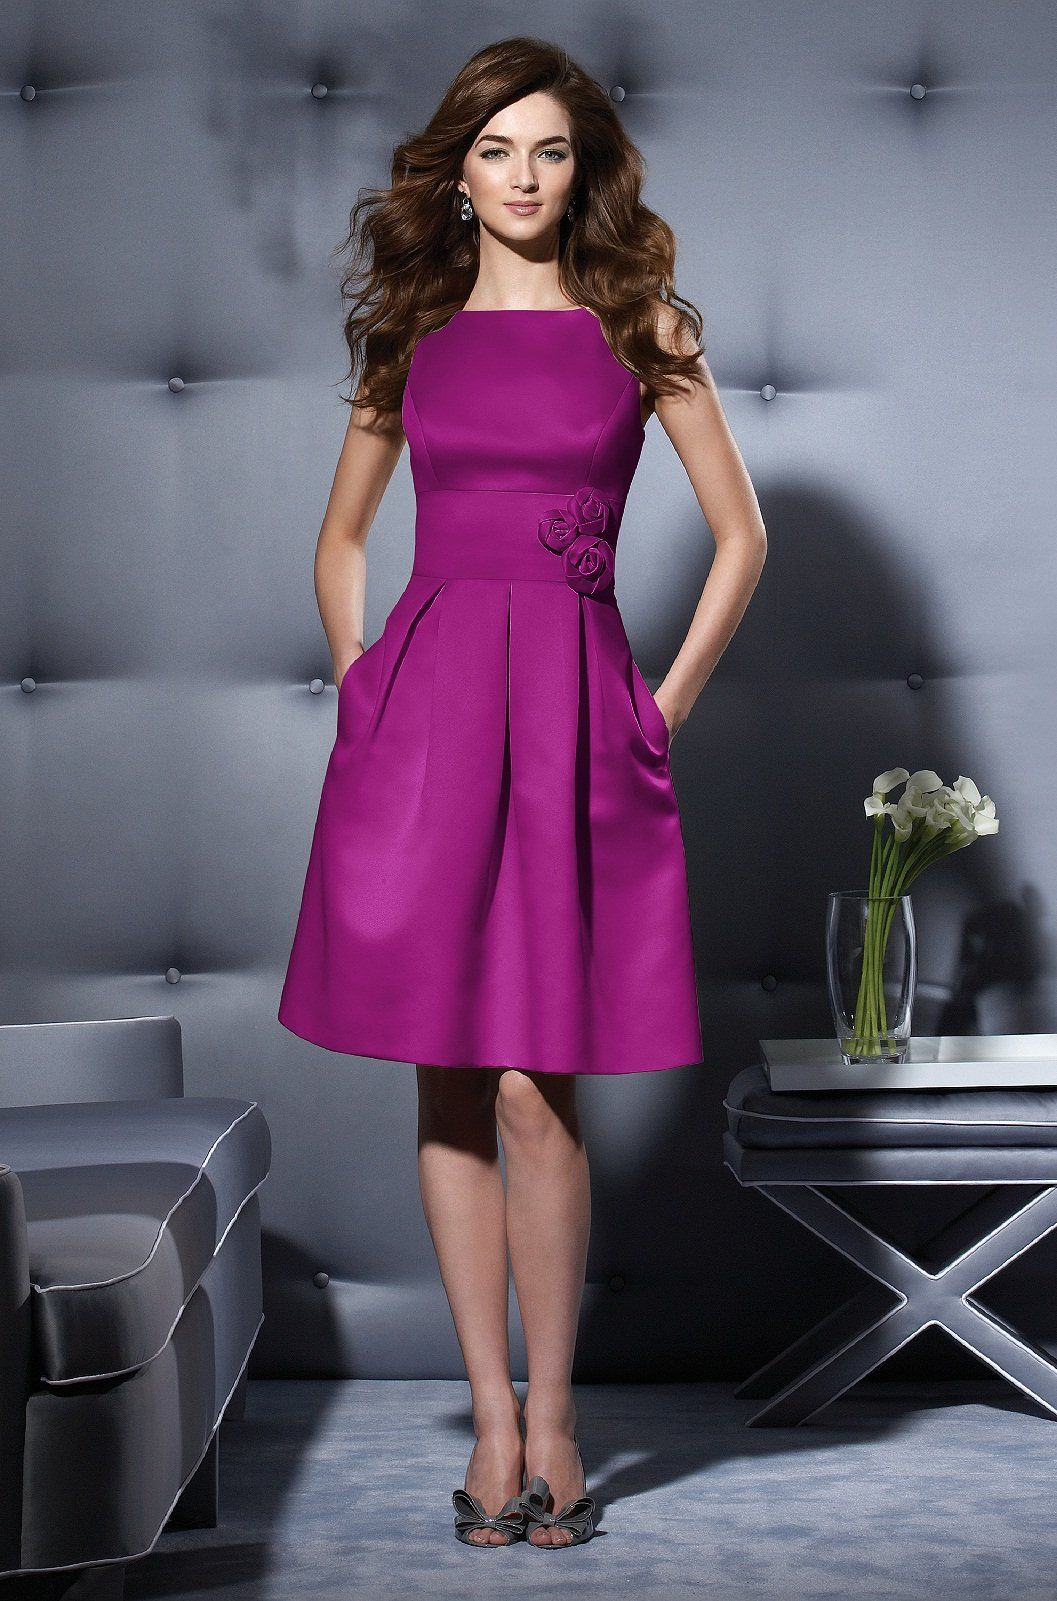 satin cocktail dress in Persian plum | laura | Pinterest ...